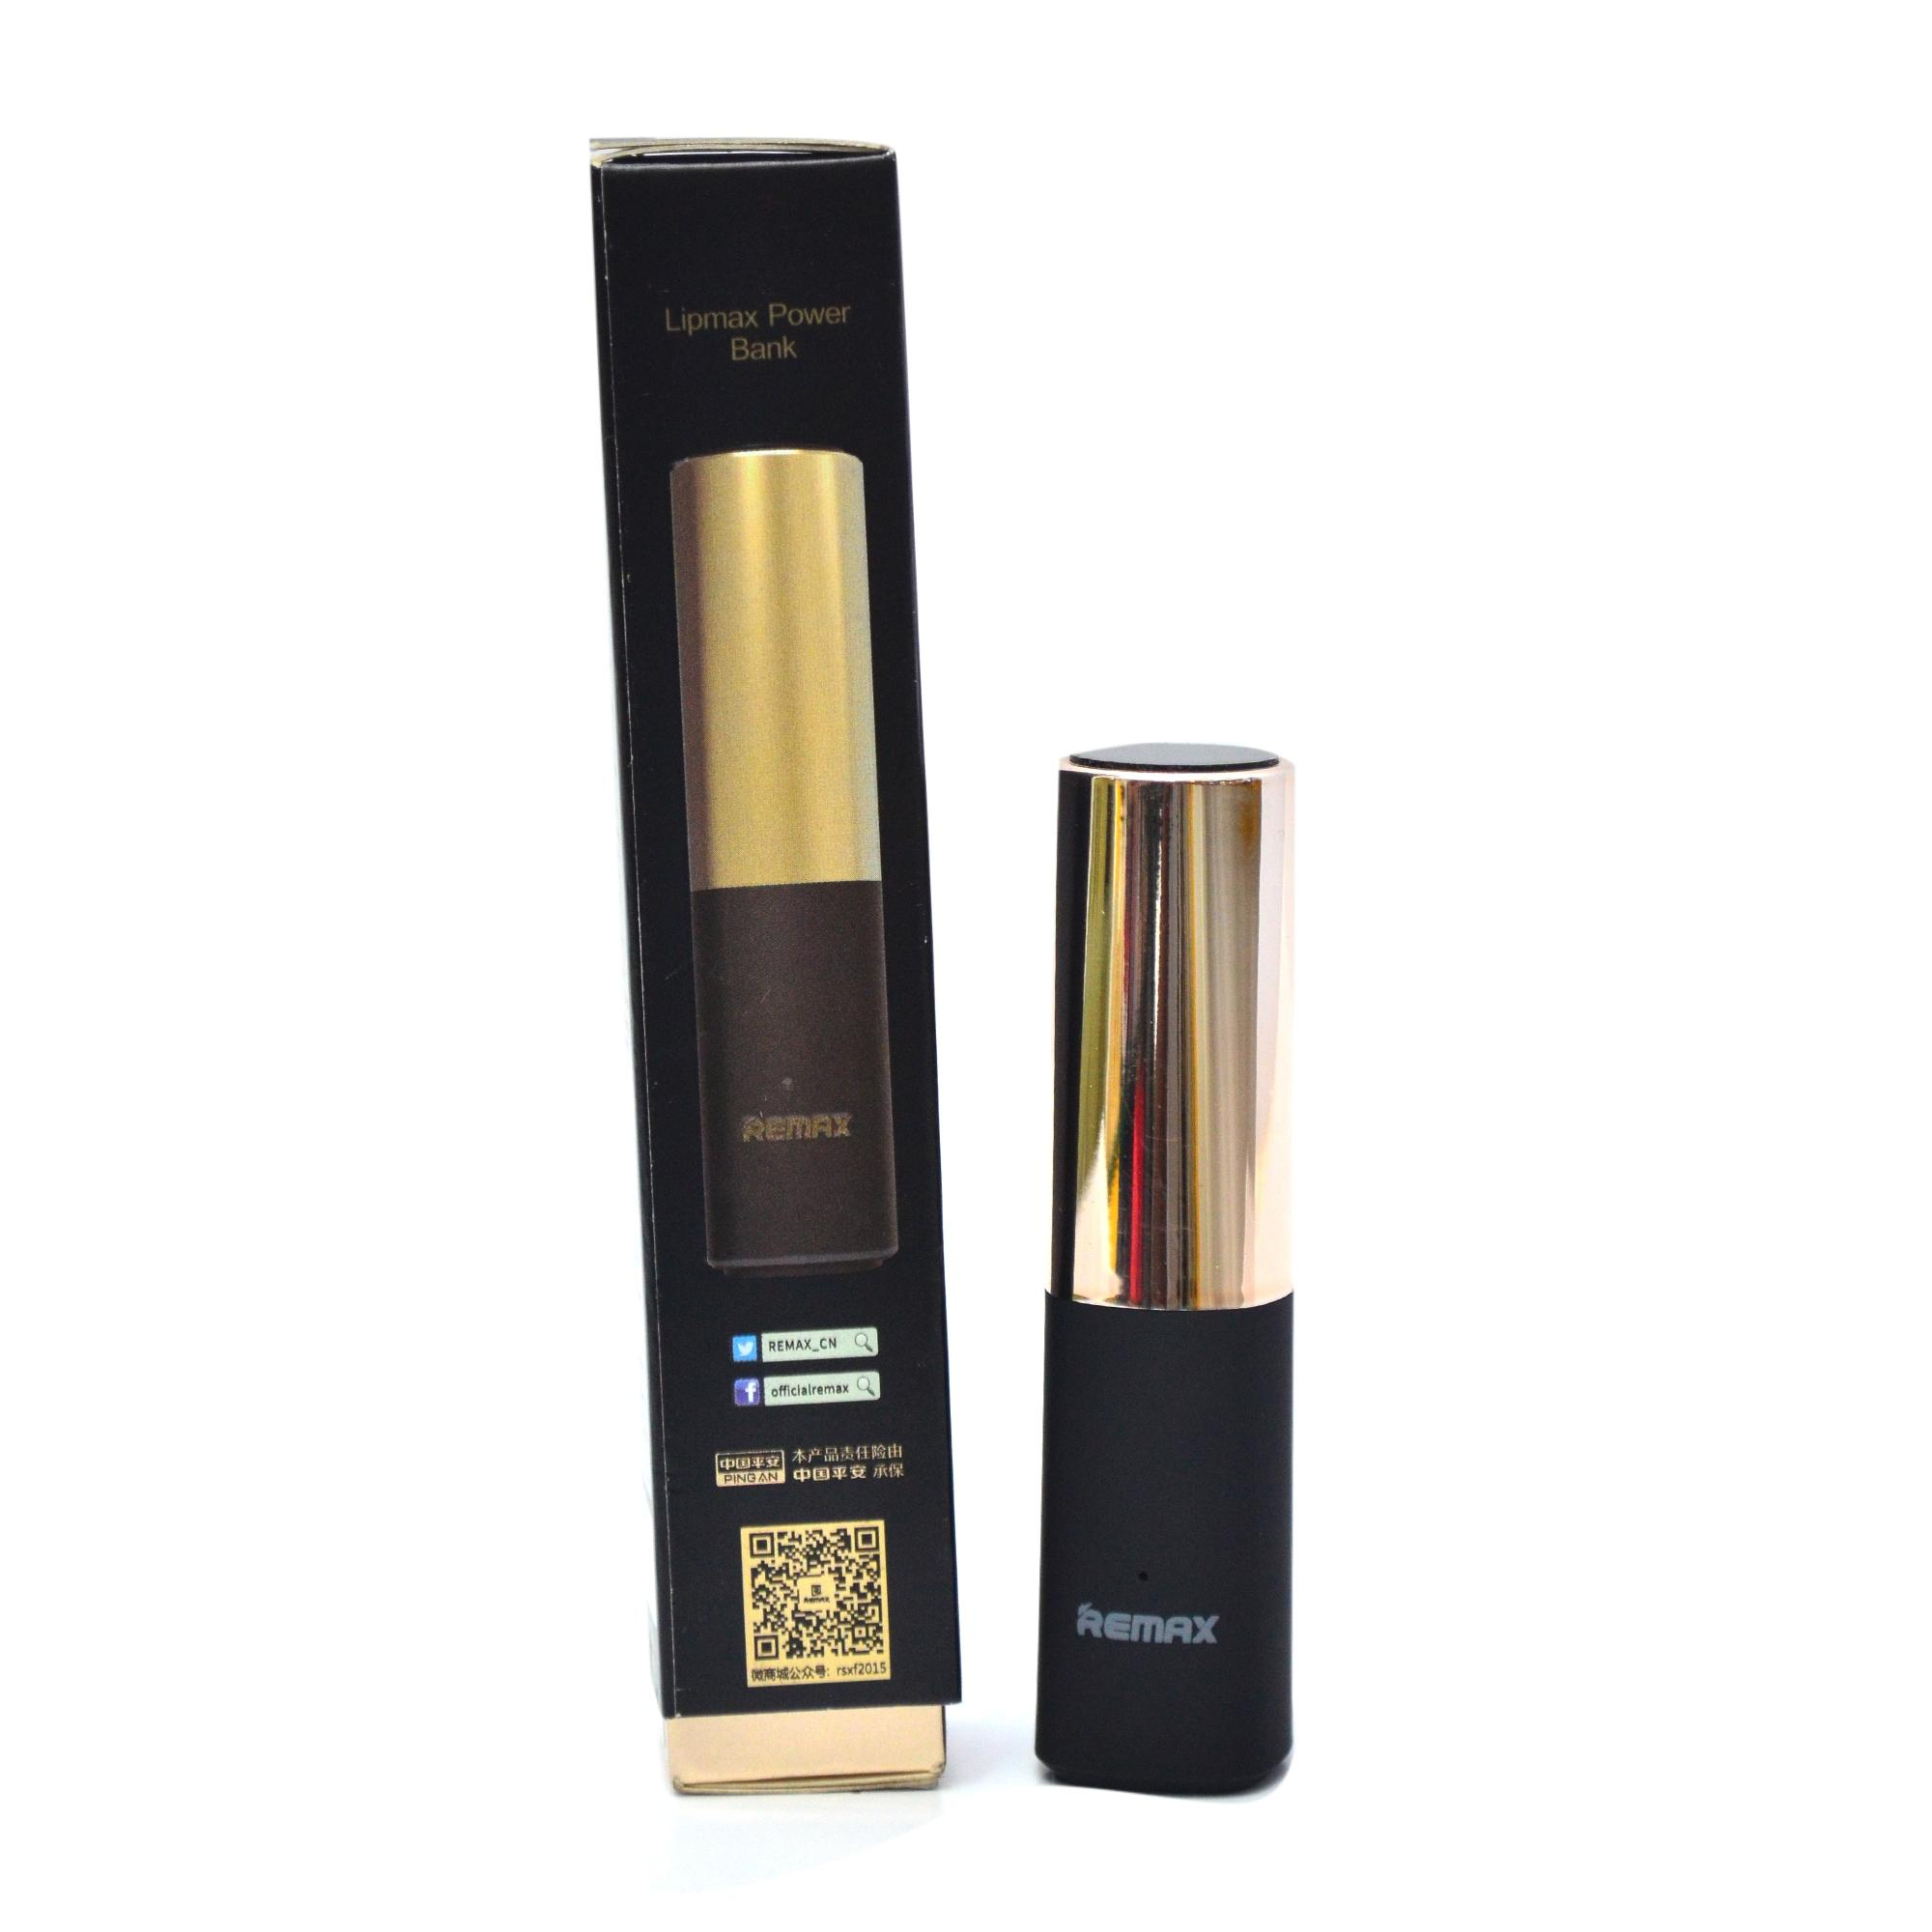 Remax Gold Powerbank 2400mAh